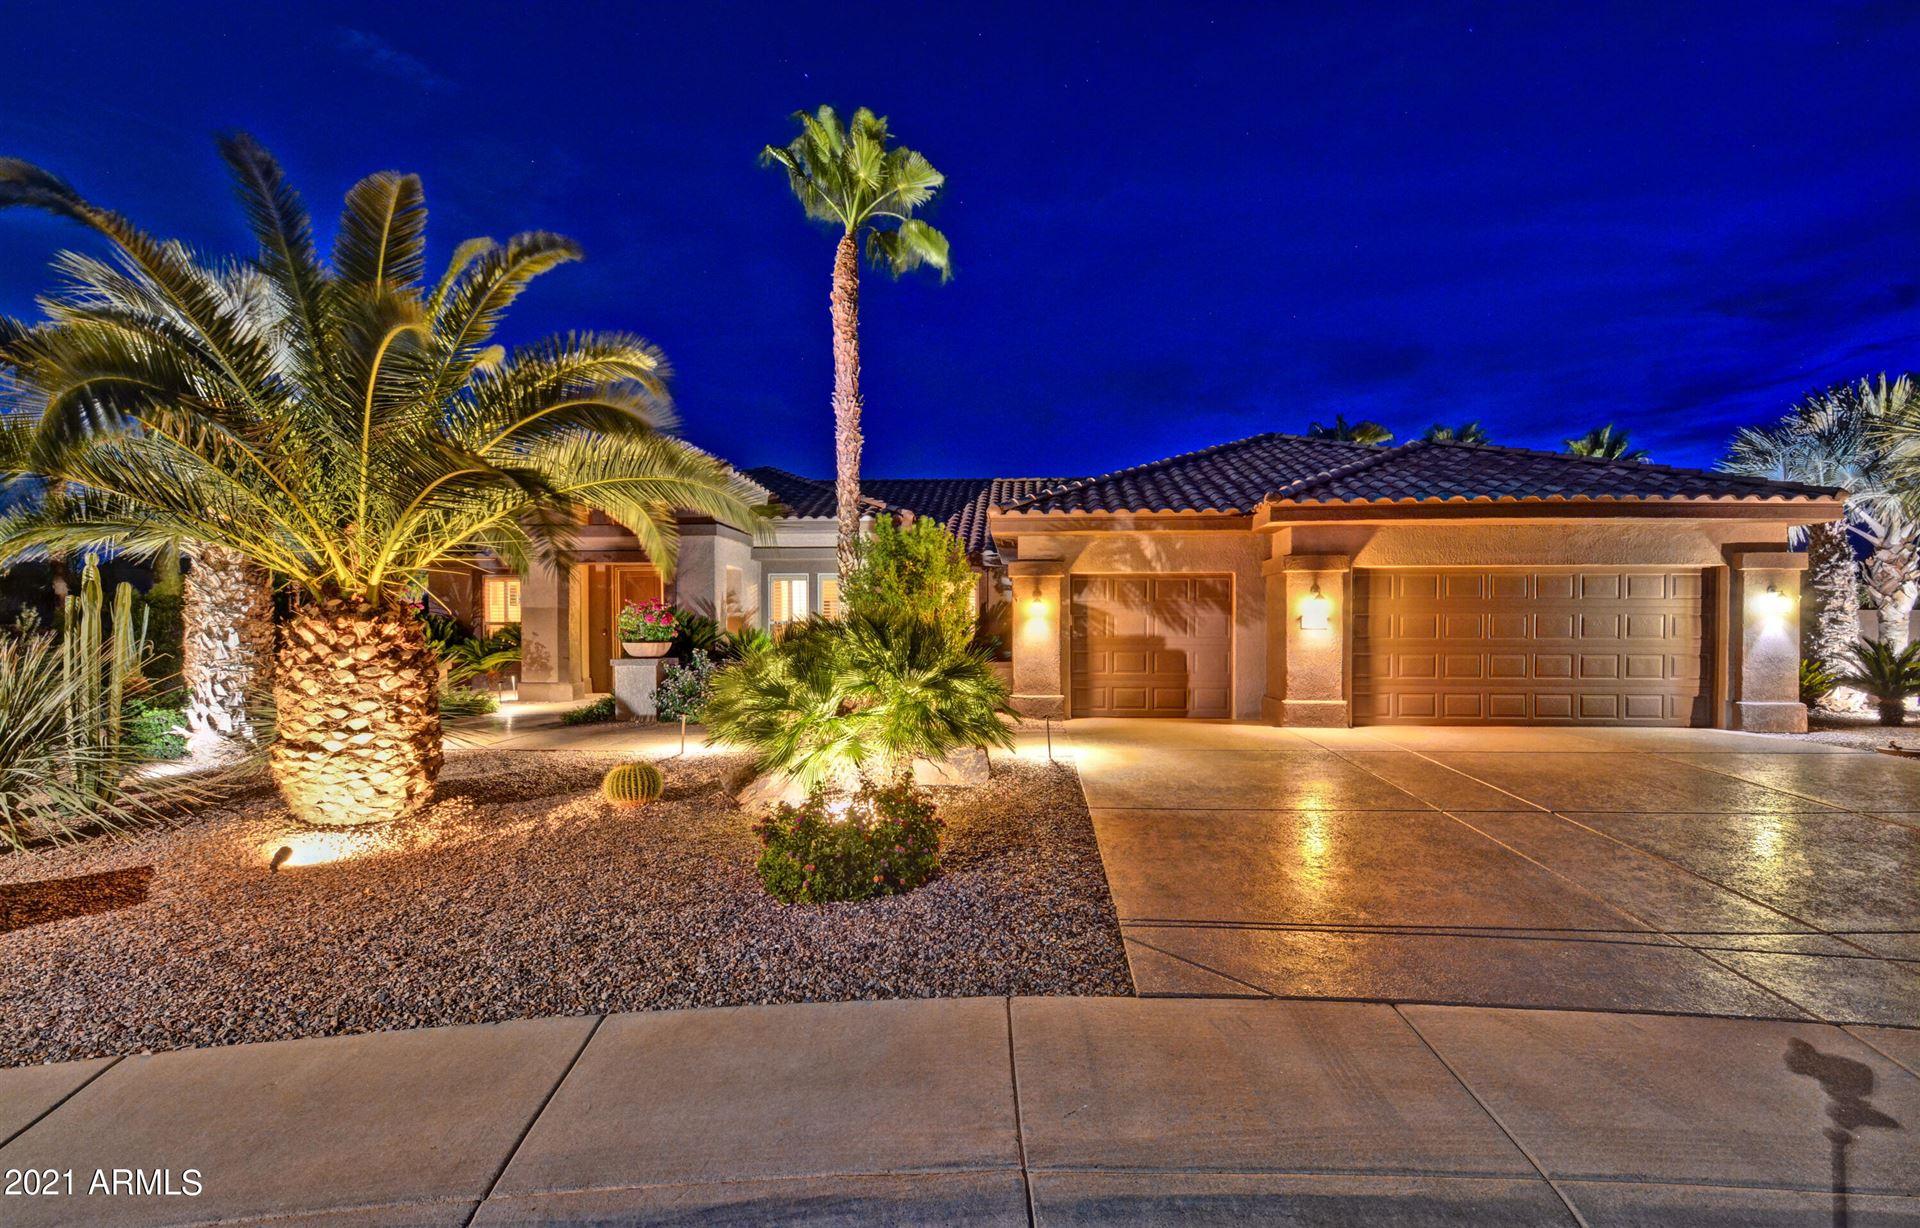 Photo of 14983 W MUIRFIELD Lane W, Surprise, AZ 85374 (MLS # 6268738)